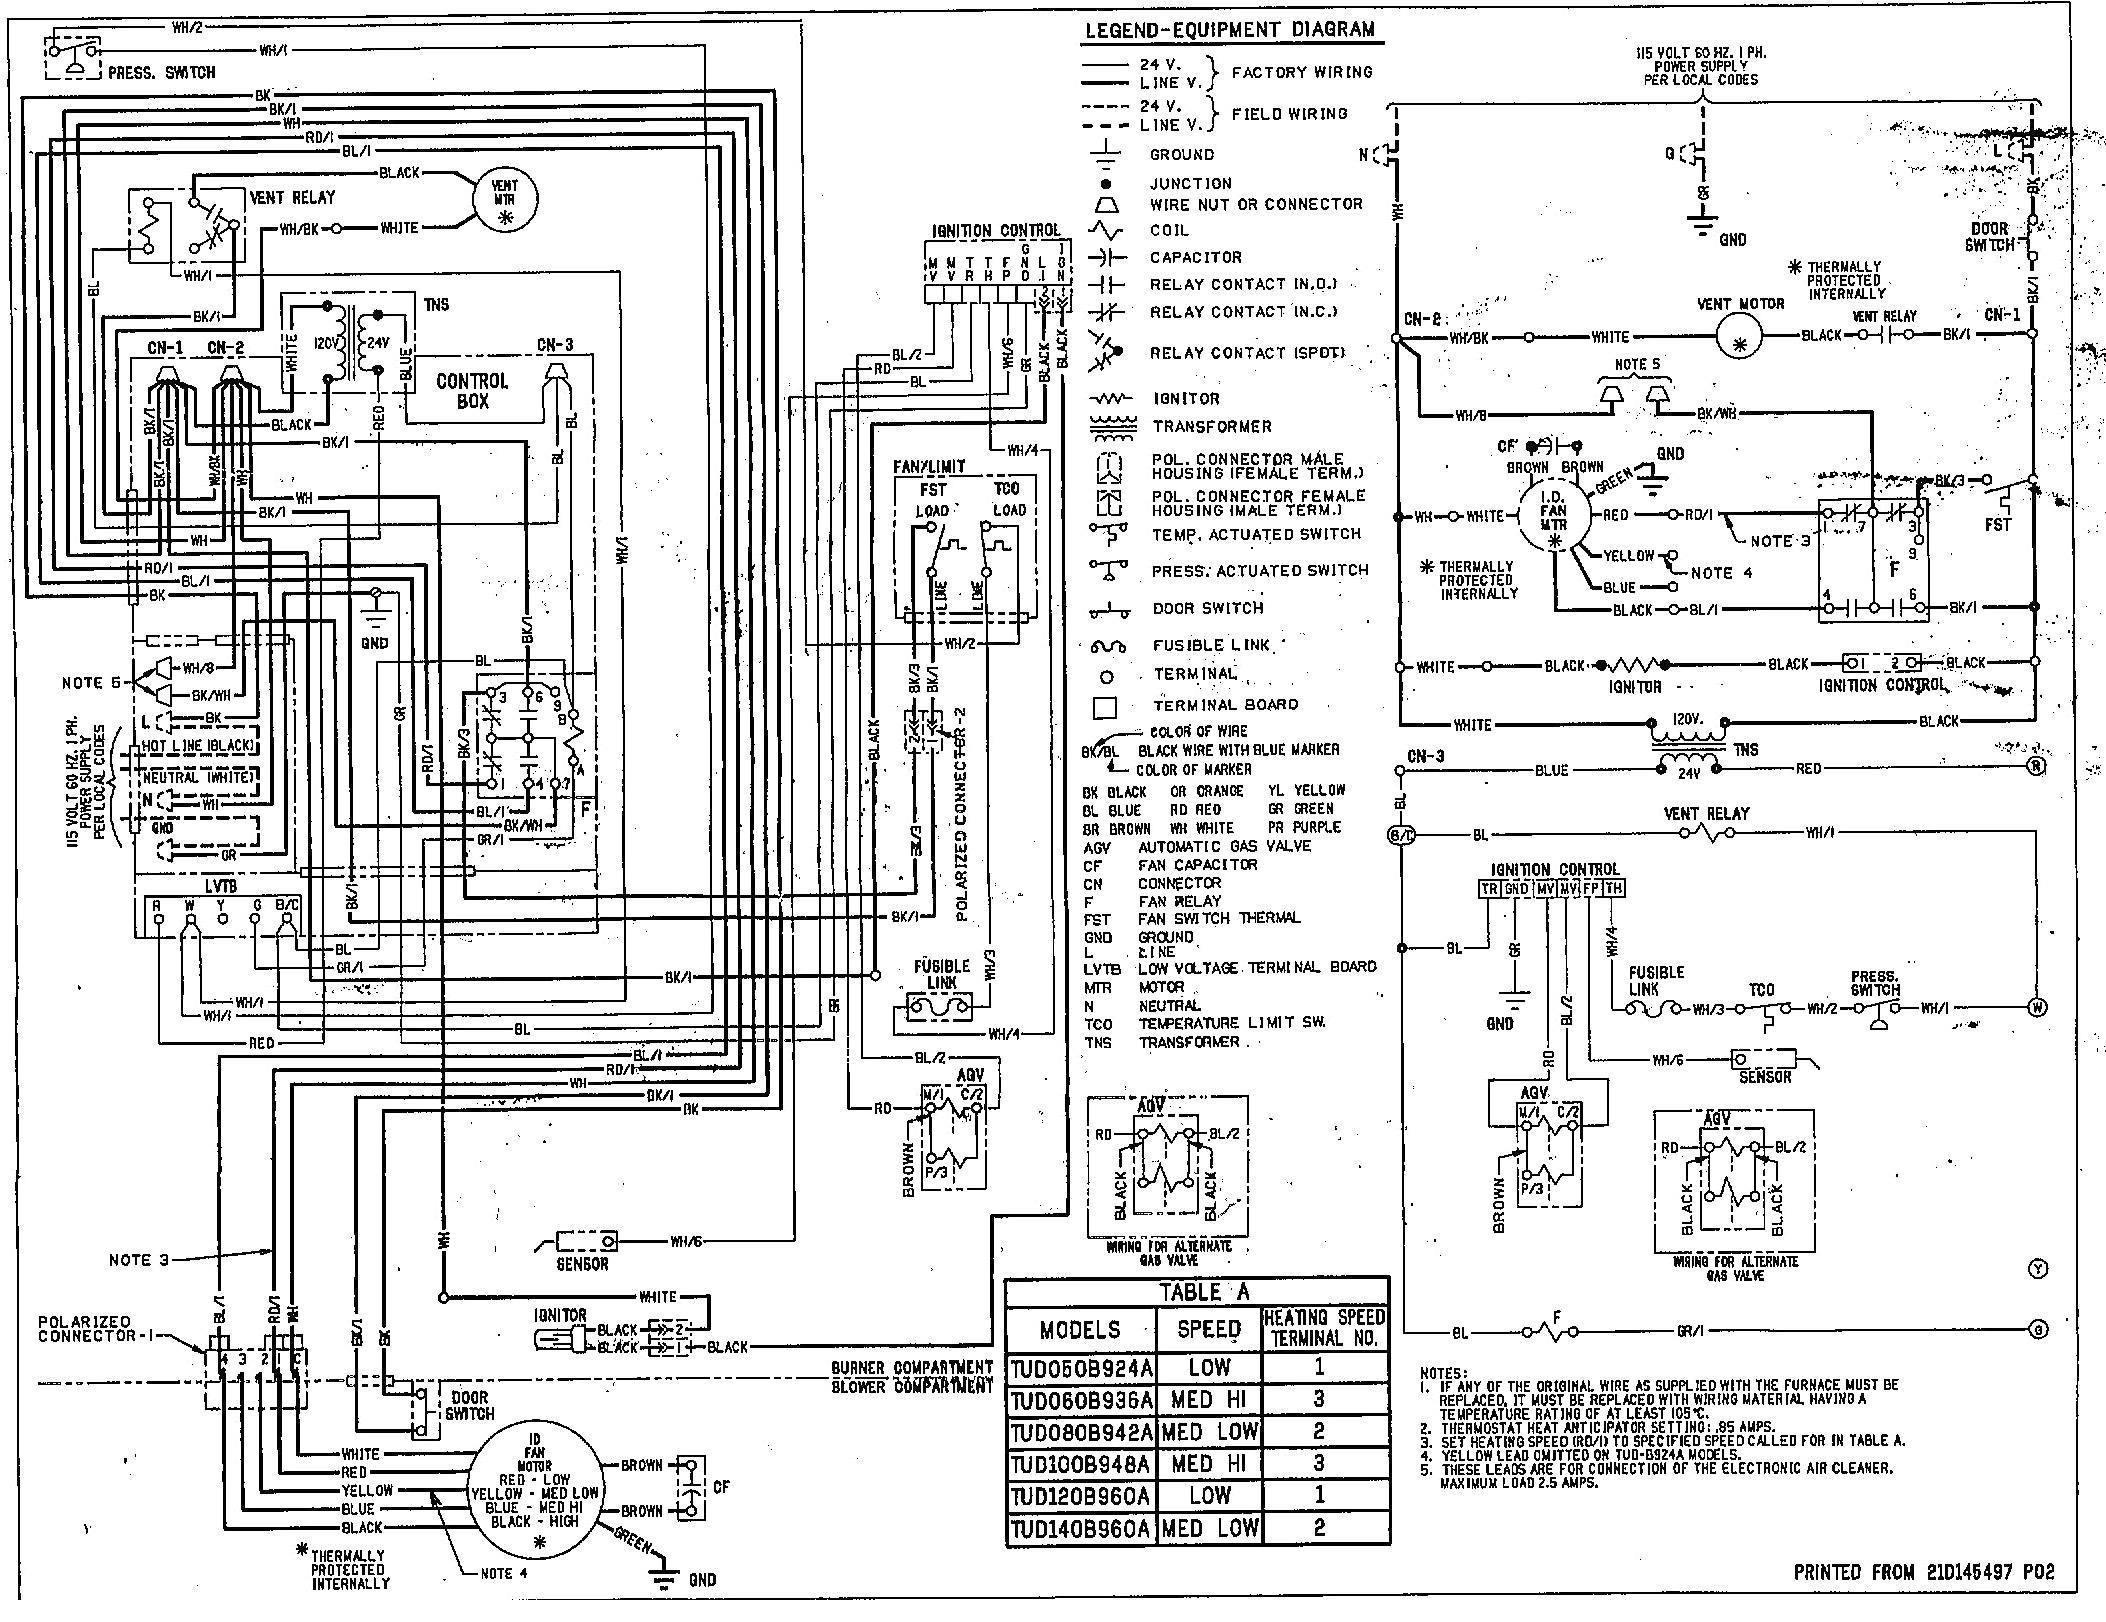 Gas Hot Water Heater Parts Diagram Suburban Gas Furnace Wiring Diagram Inspirational Suburban Rv Heater Of Gas Hot Water Heater Parts Diagram